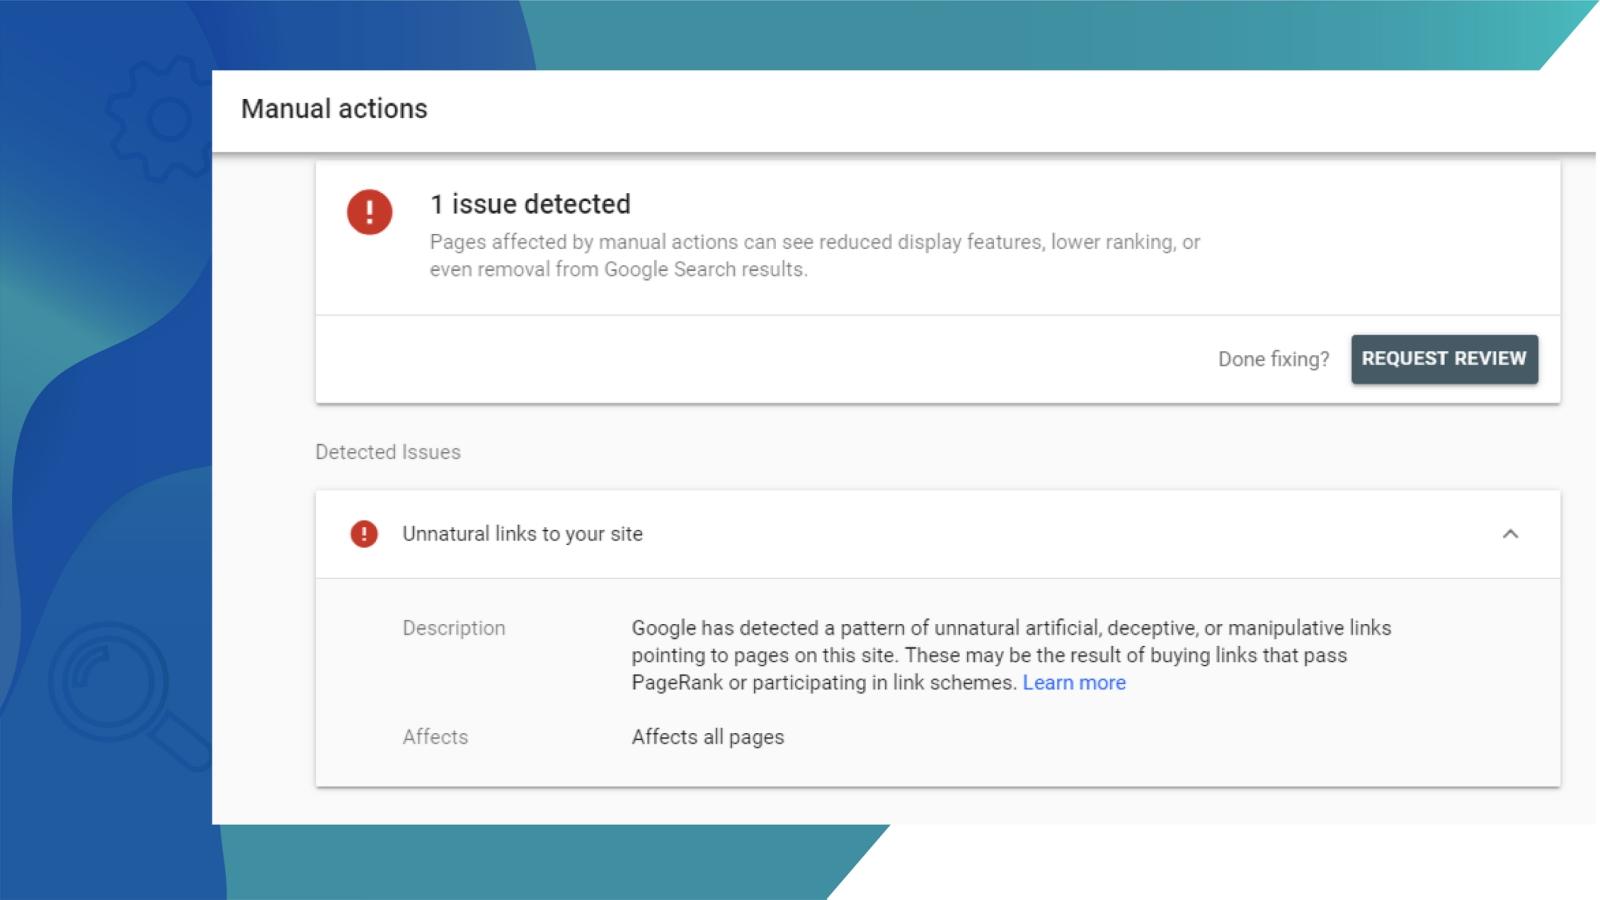 Google Manual Actions